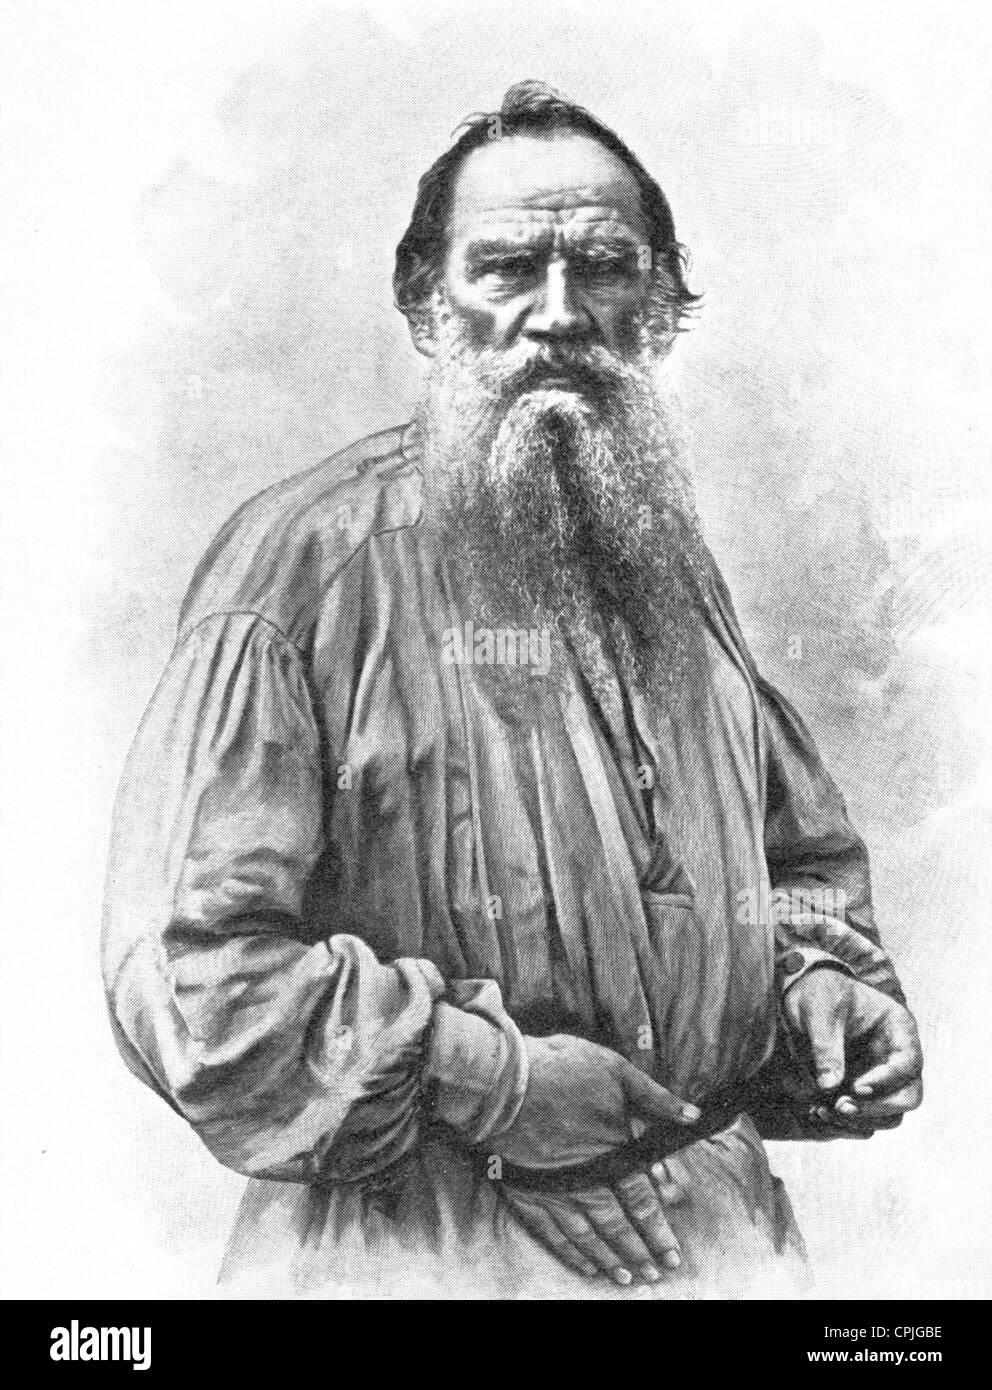 LEO TOLSTOY (1828-1910) Russian writer - Stock Image